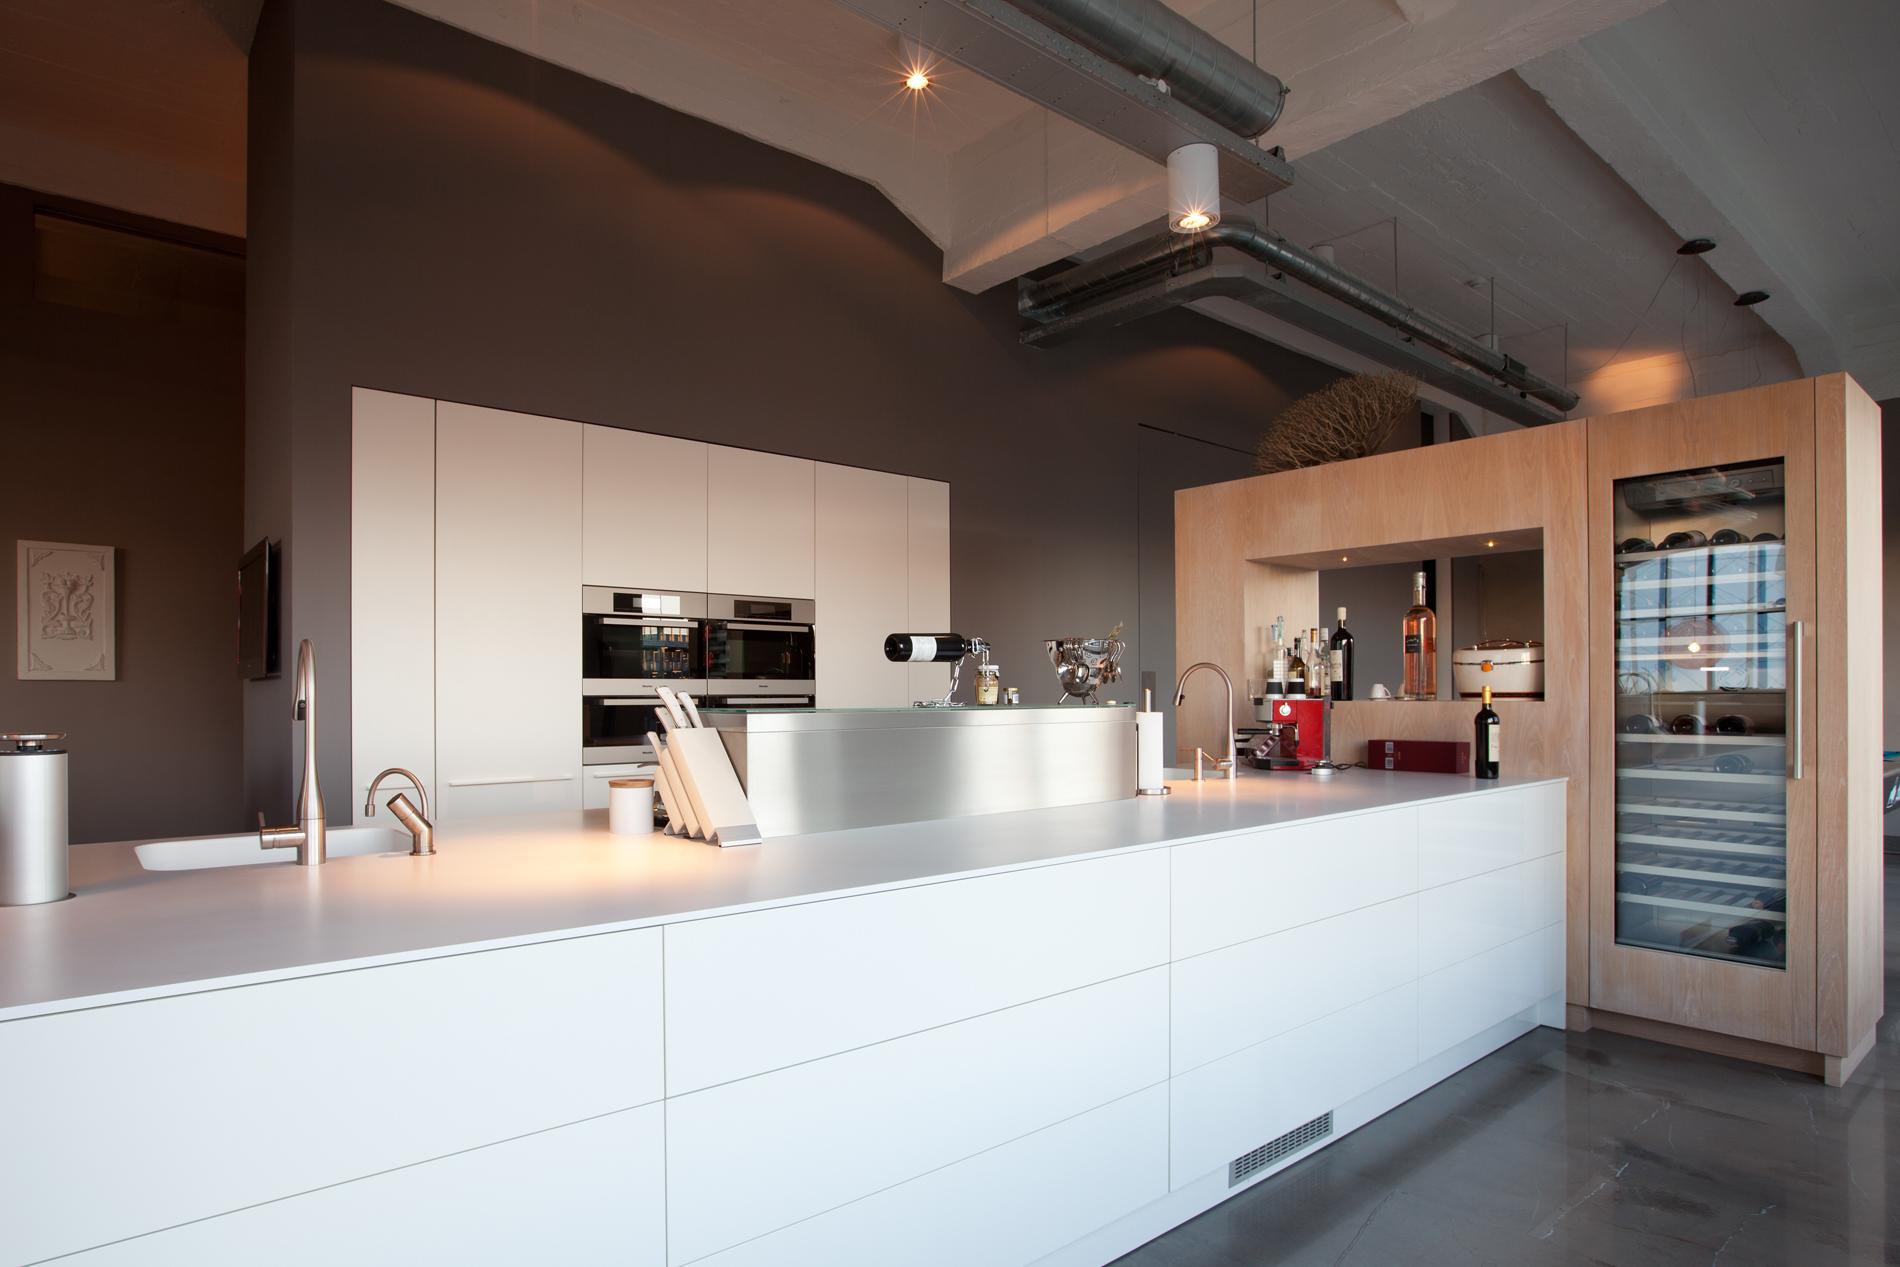 Keuken Design Hilversum : Houtsma keukens hilversum keuken design hilversum artsmedia